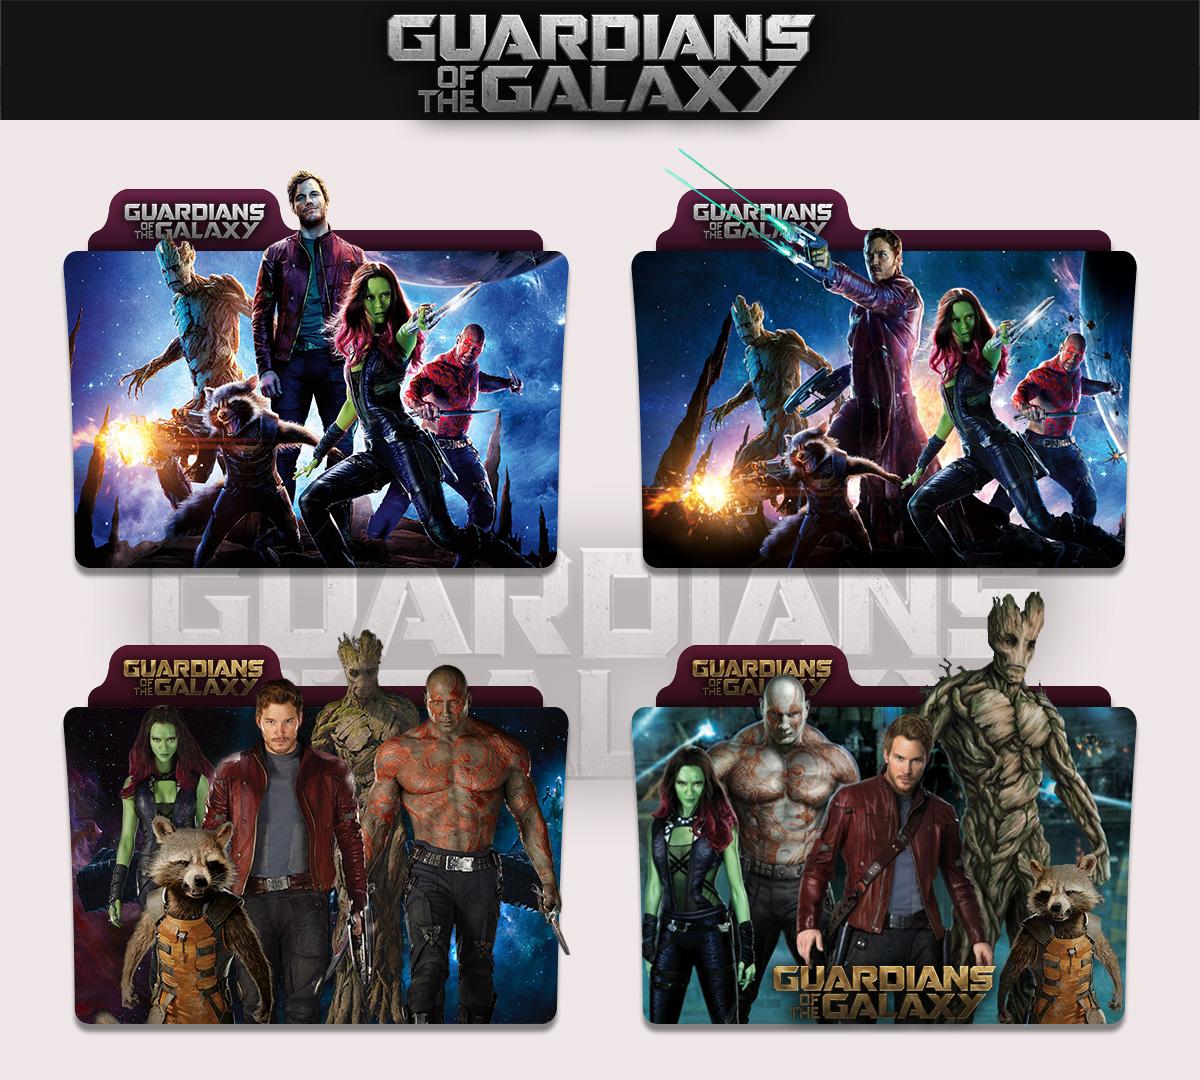 Guardians Of The Galaxy 2014 Folder Icon By Sonerbyzt On Deviantart